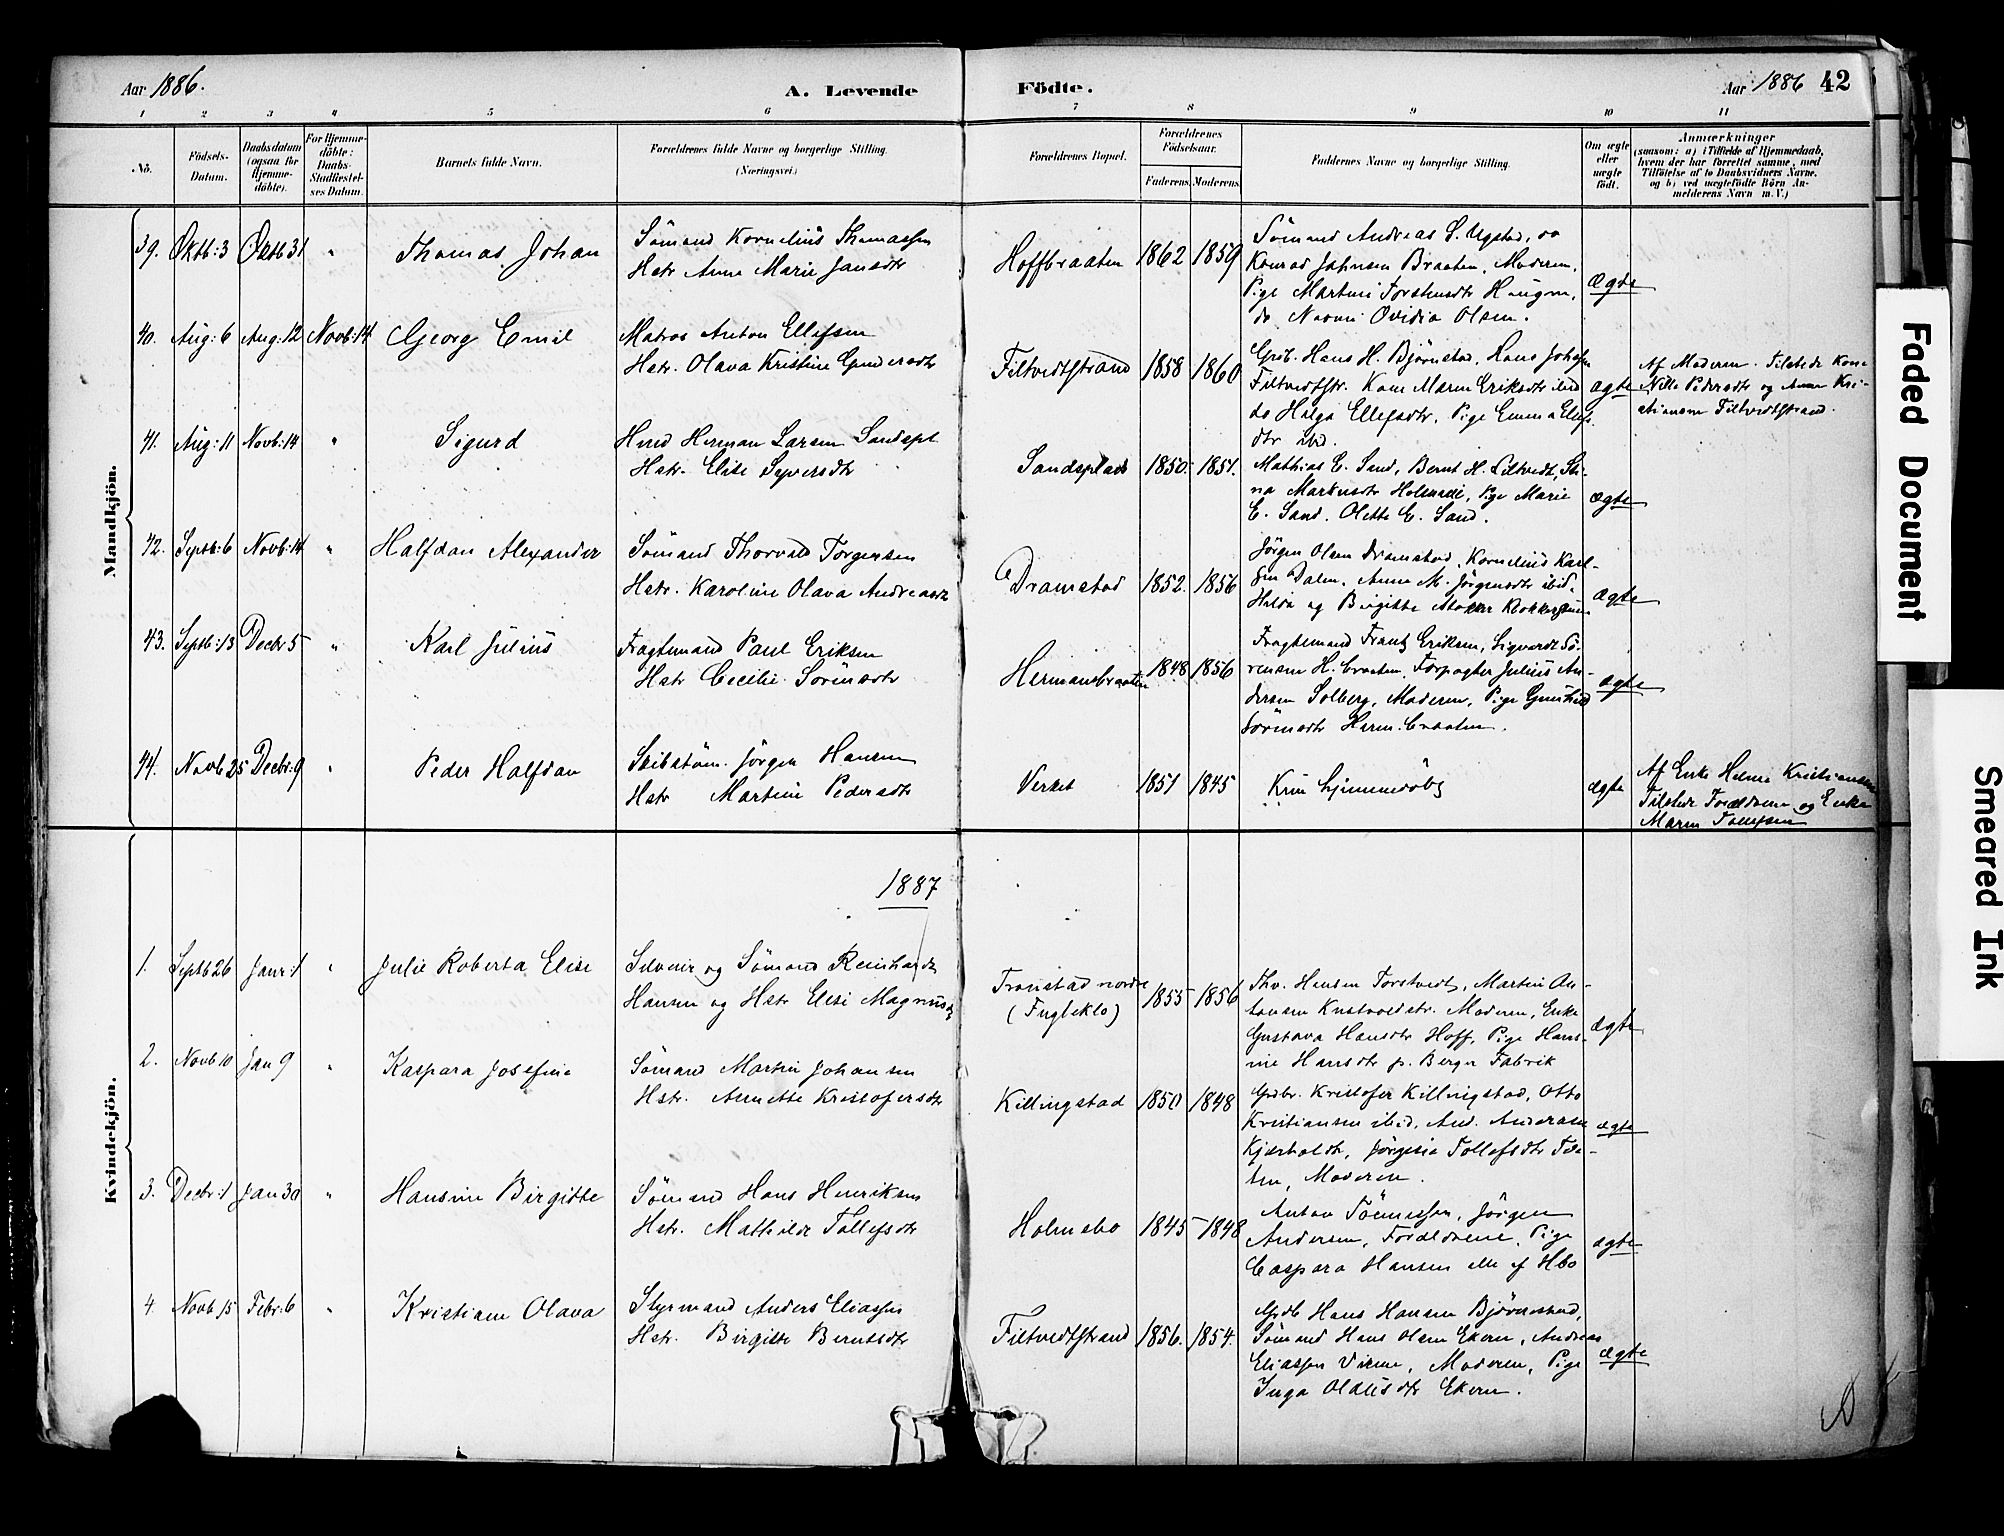 SAKO, Hurum kirkebøker, F/Fa/L0014: Ministerialbok nr. 14, 1882-1895, s. 42